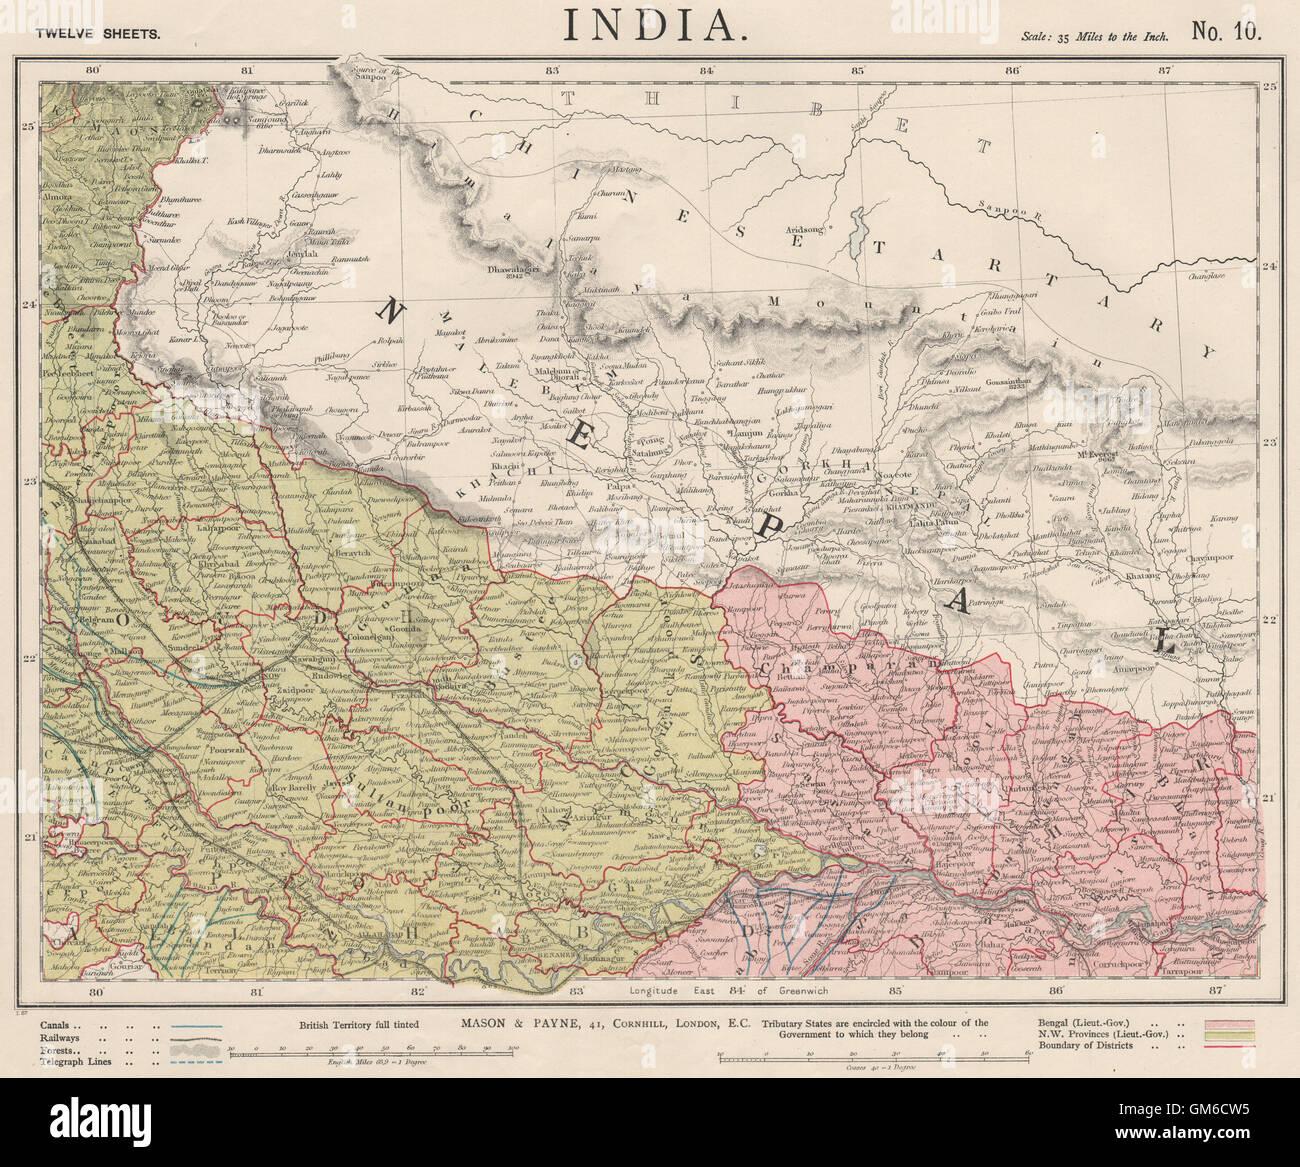 India Map Ganges Stock Photos India Map Ganges Stock Images Alamy